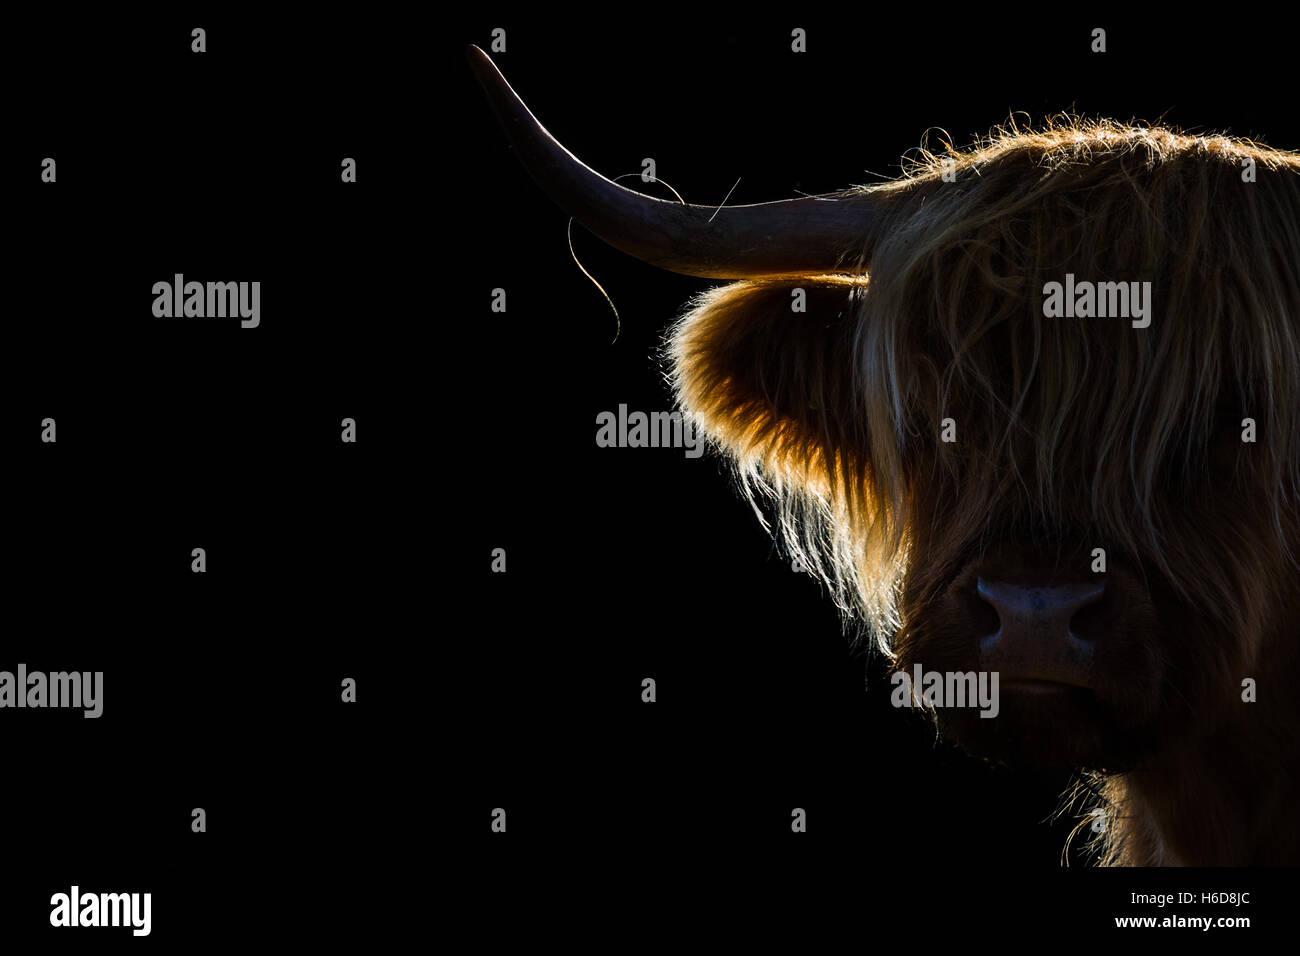 Backlit Highland mucca in luce del sole di mattina. Immagini Stock